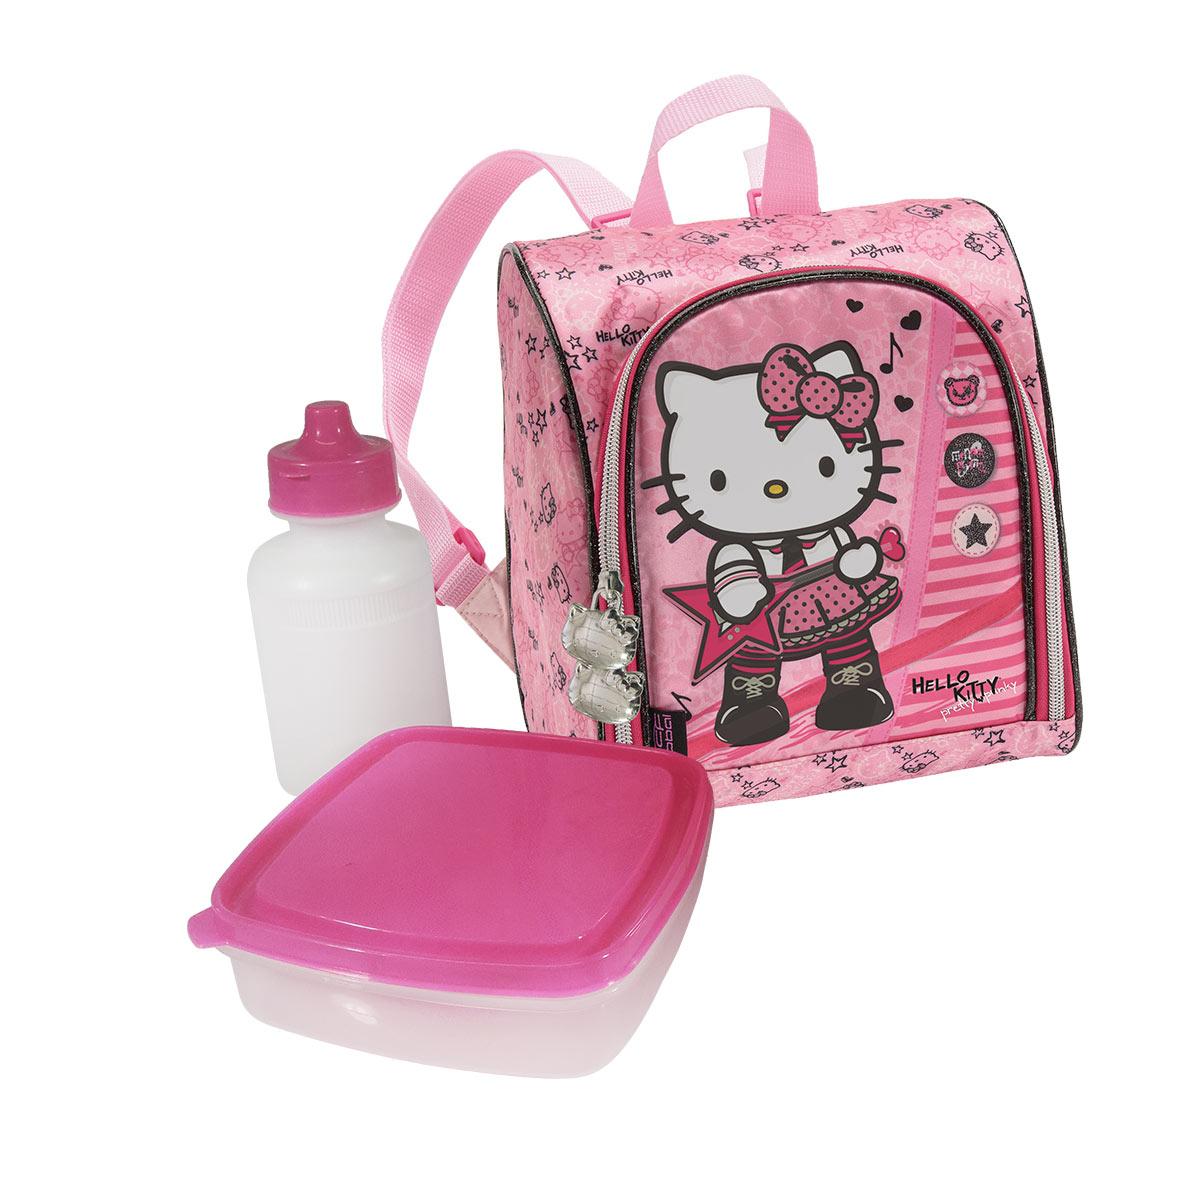 Lancheira Hello Kitty Pretty Rock 924M09